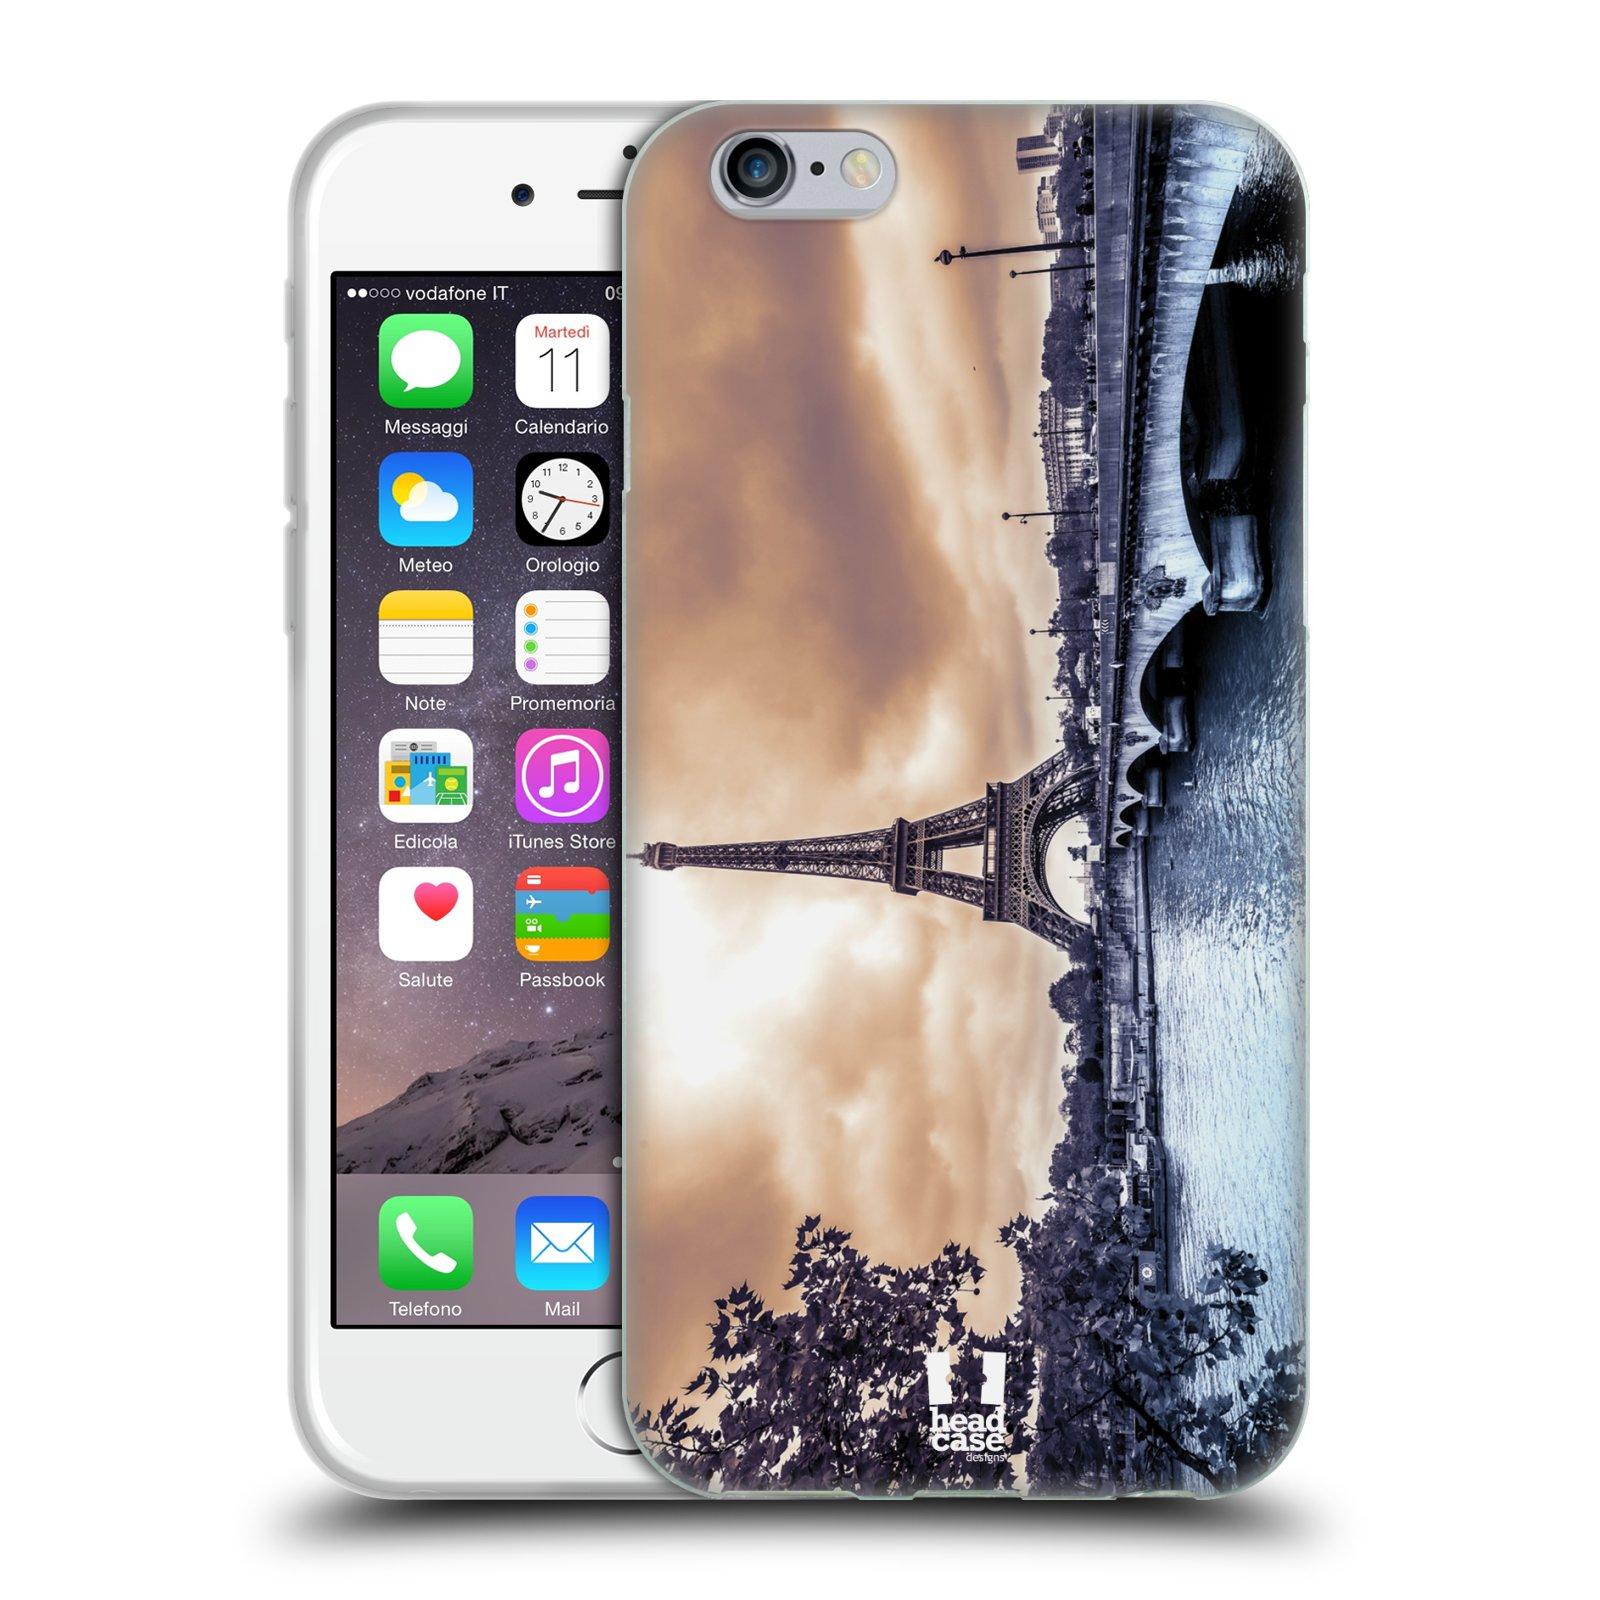 HEAD CASE silikonový obal na mobil Apple Iphone 6 6S vzor Panoramata měst  horizontální foto empty d35d0069adf